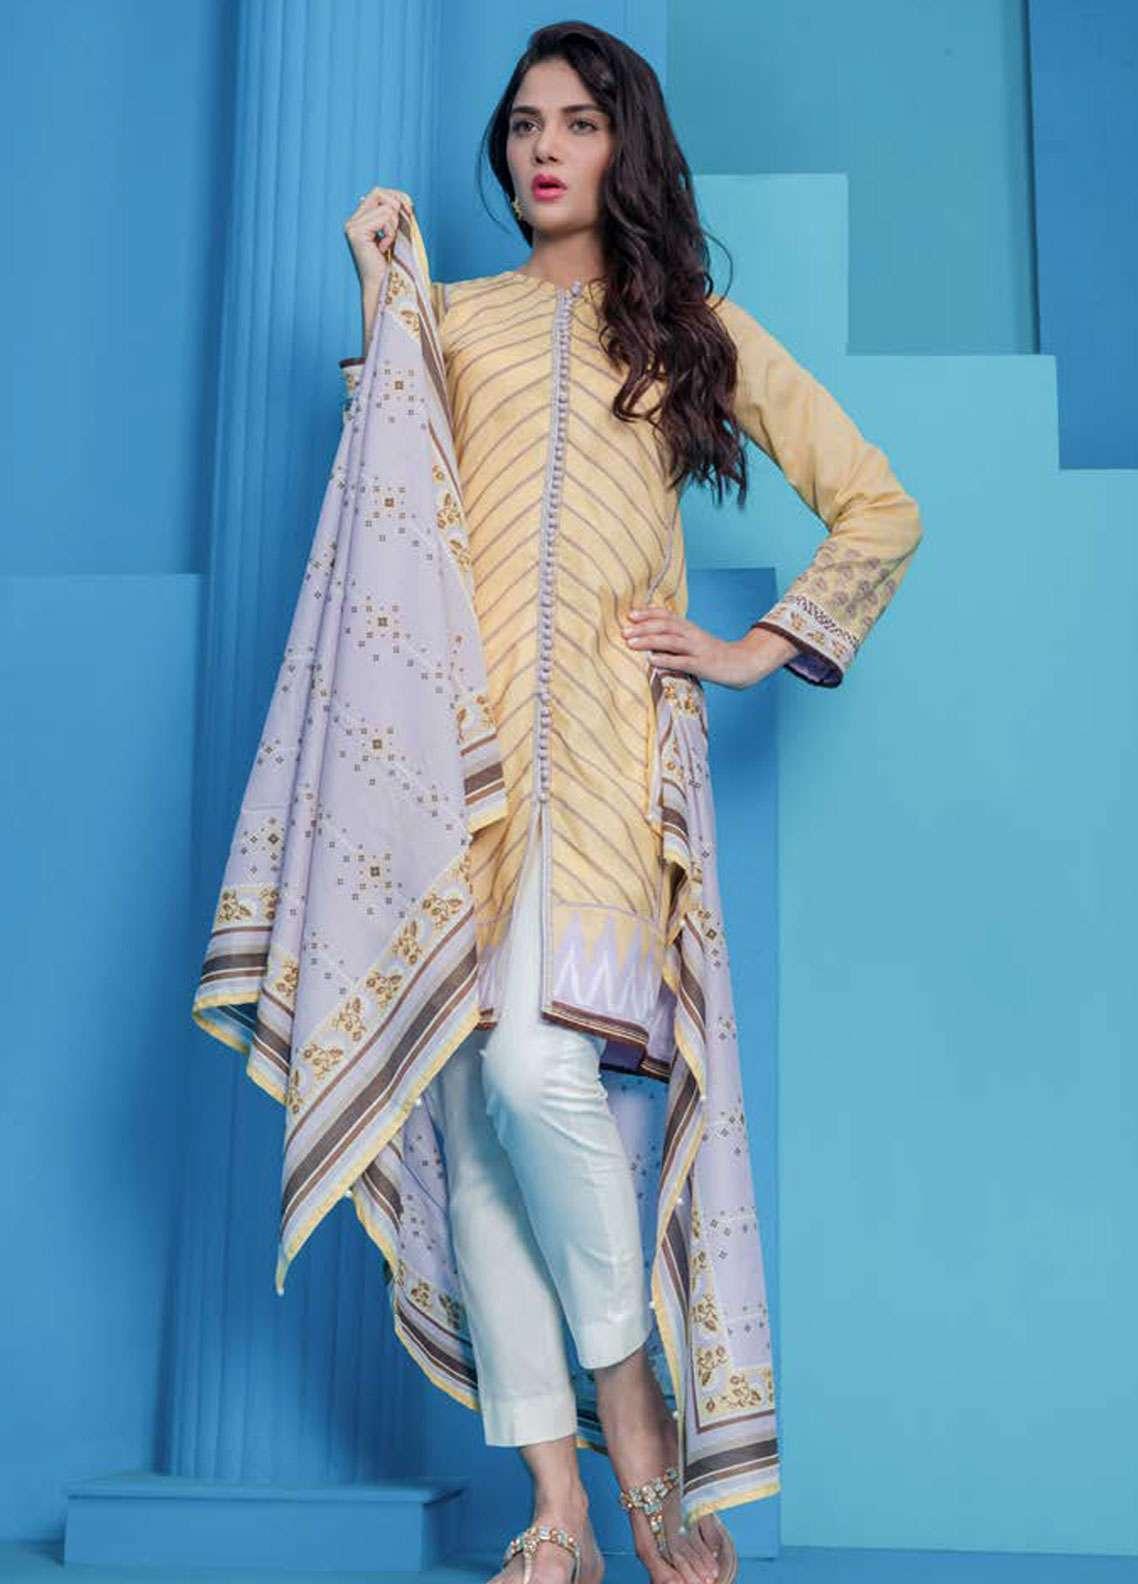 Orient Textile Printed Lawn Unstitched 2 Piece Suit OT19L 020 Ikat B - Spring / Summer Collection